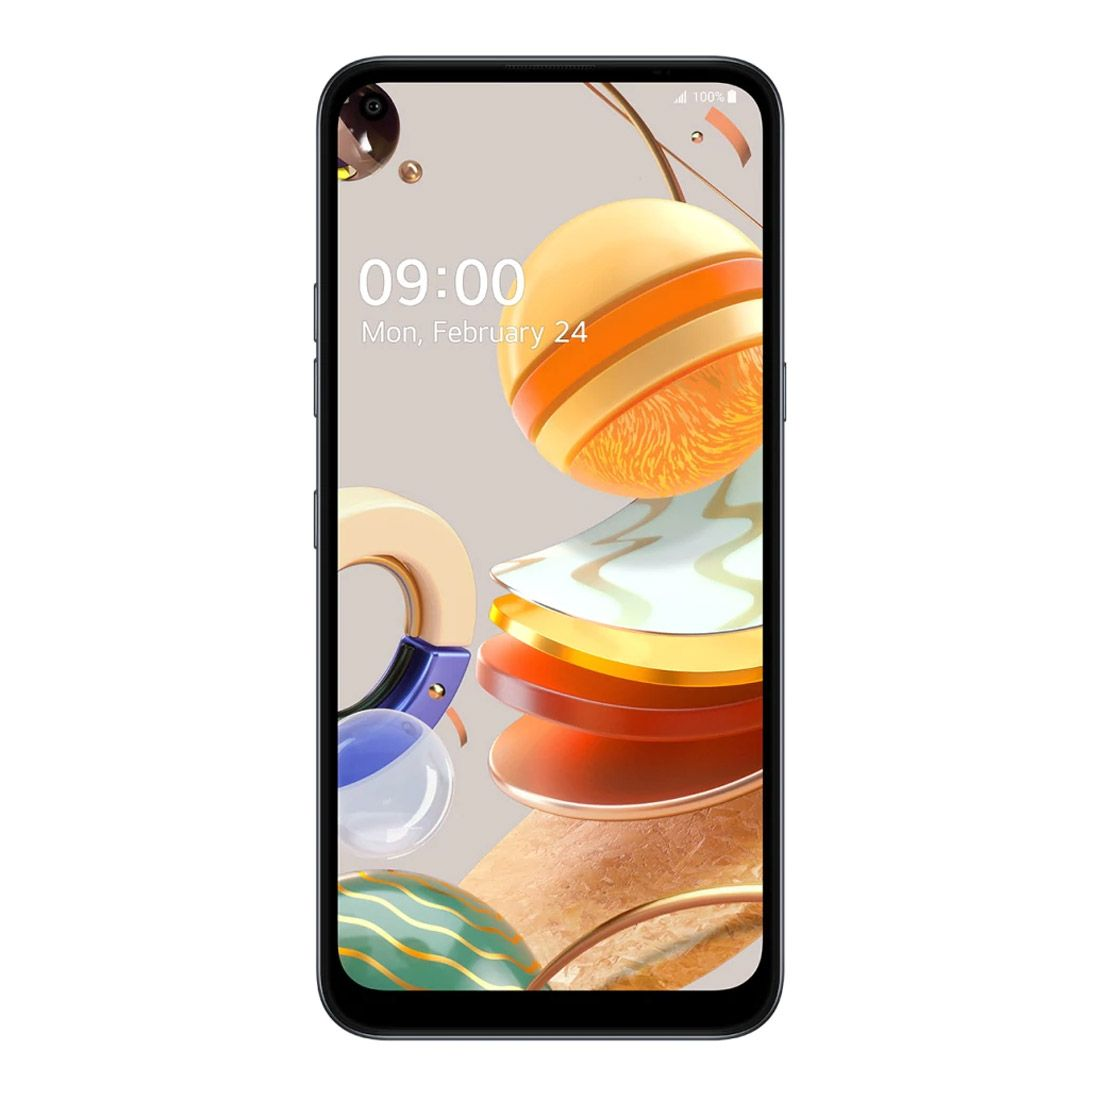 LG K61 Titan Grey - 6.53' HD+ Screen Size, Octa Core Processor, 4GB RAM, 128GB Memory exp to 2TB Via MicroSD, Quad Camera, Dual Sim, 4000 mAh Battery